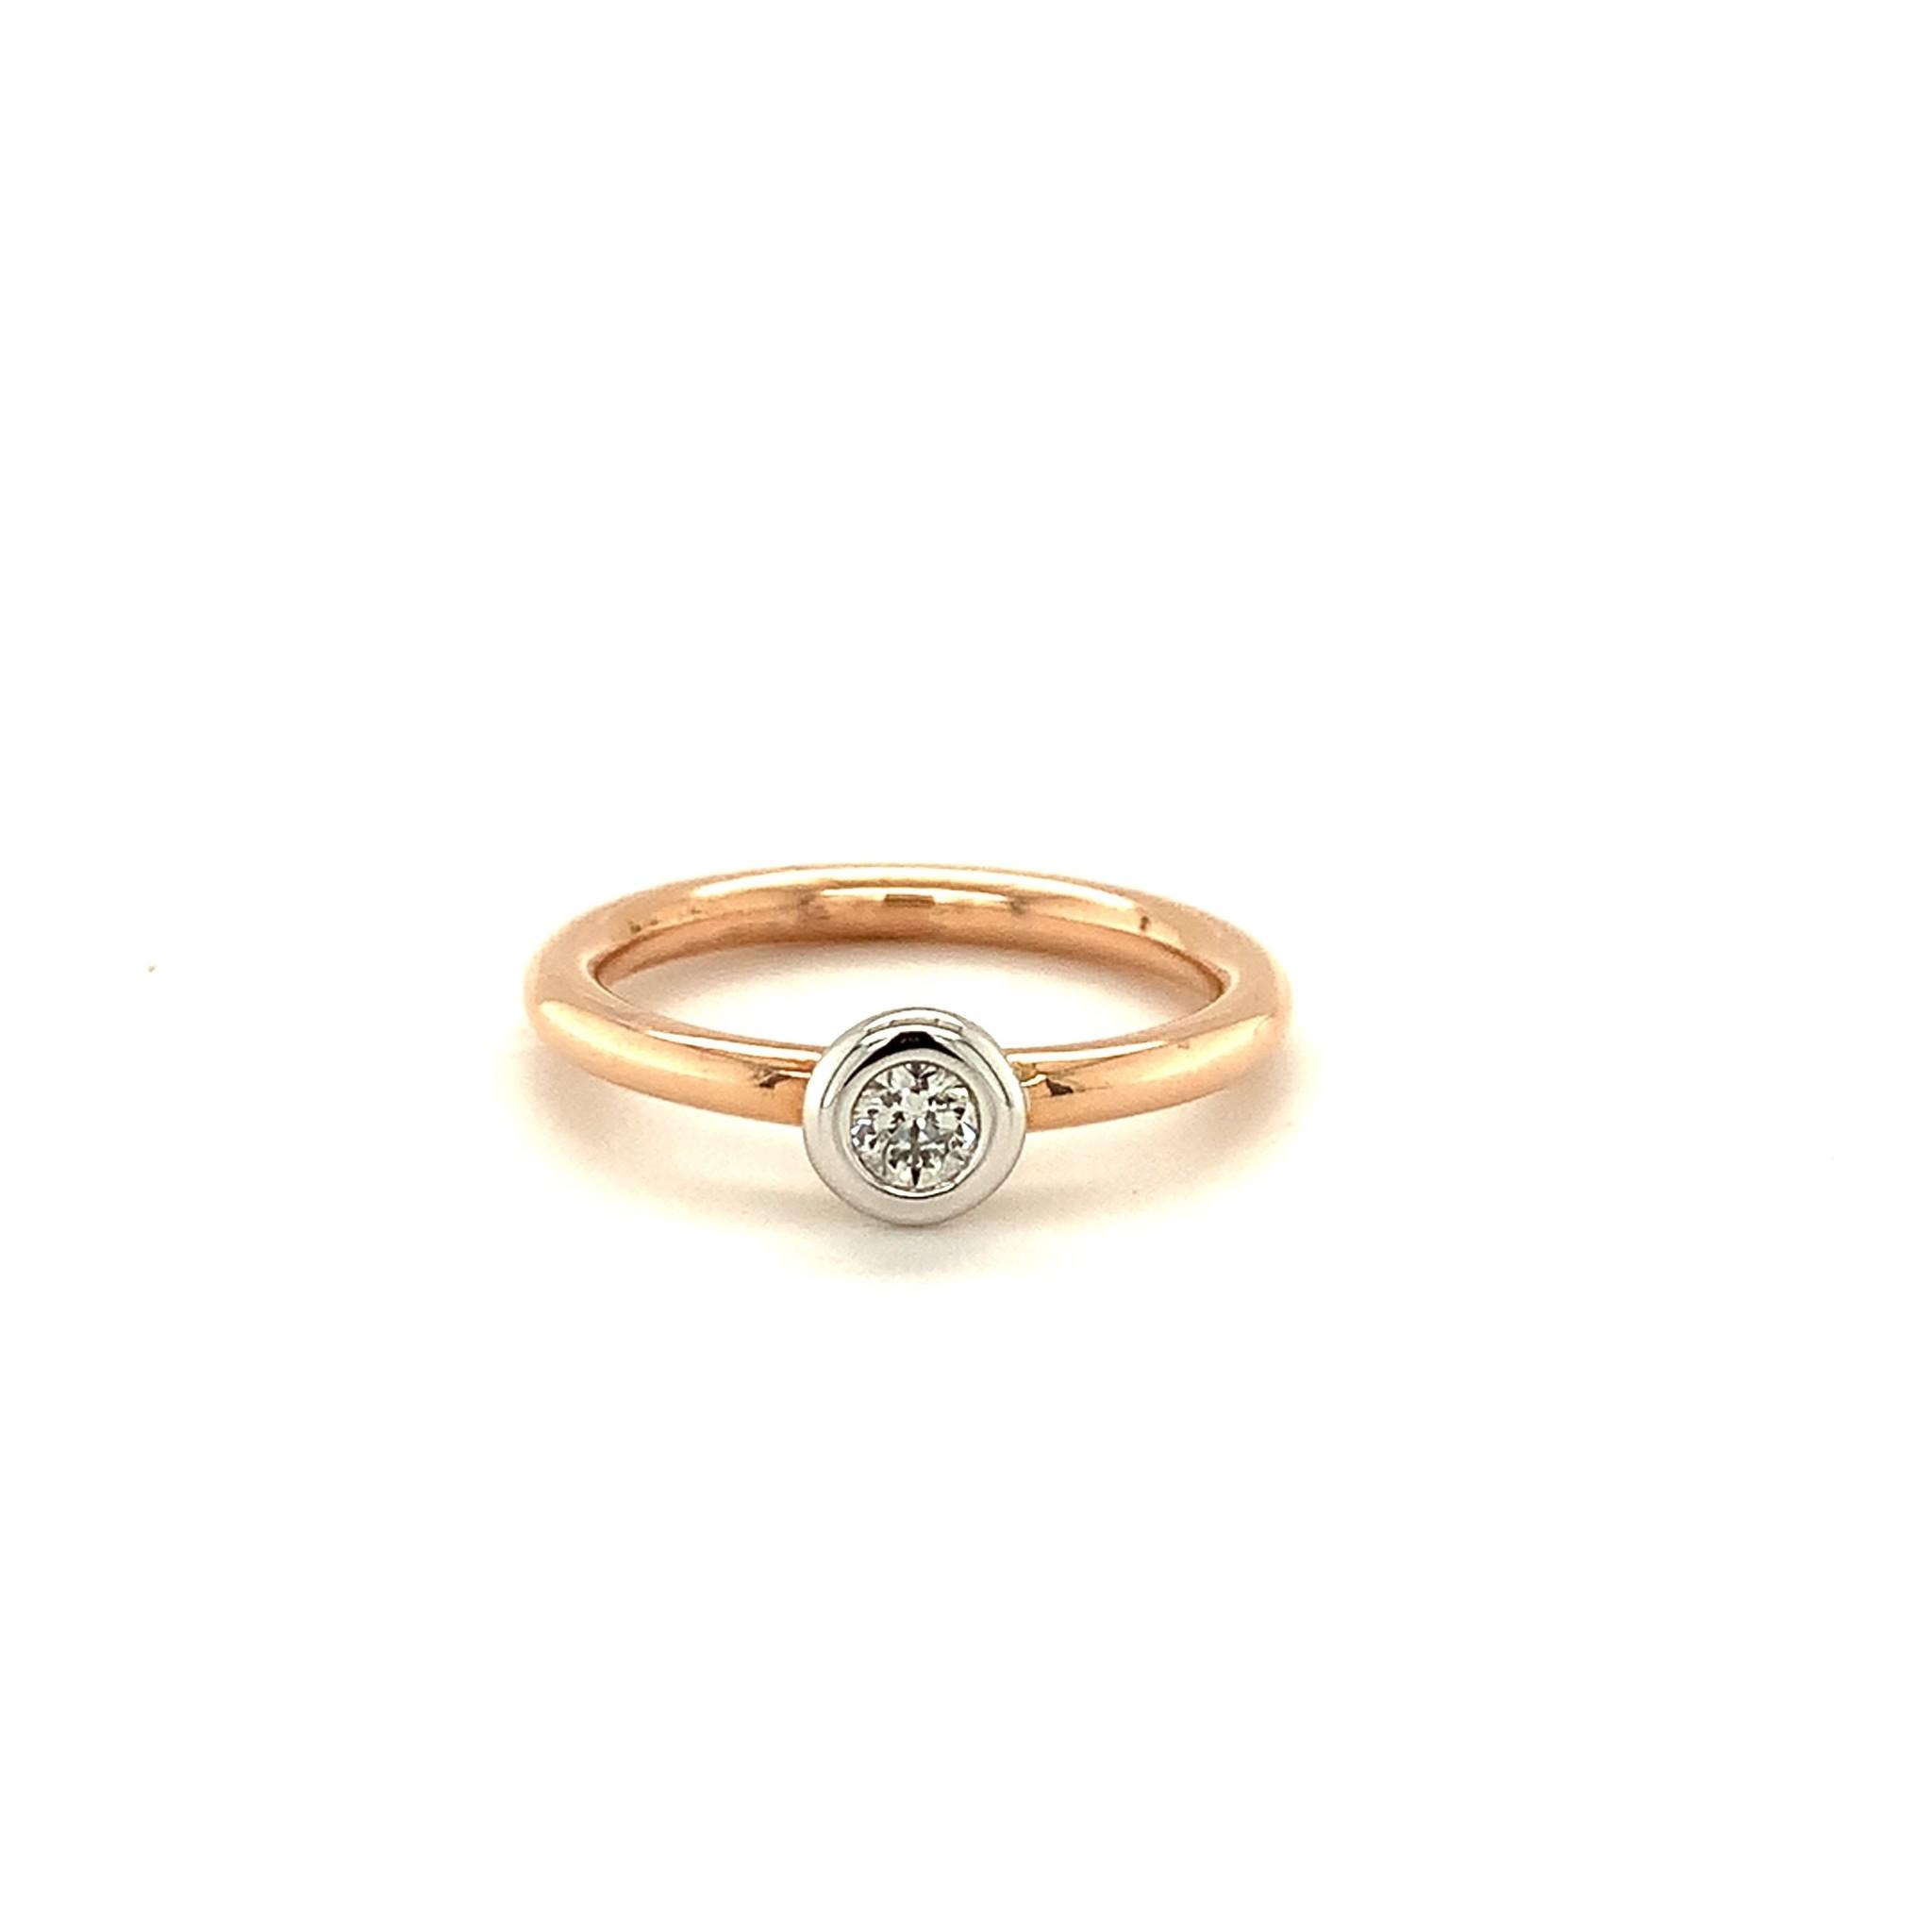 ROEMER by Bregje ROEMER by Bregje rosegouden ring met 0.20ct diamant